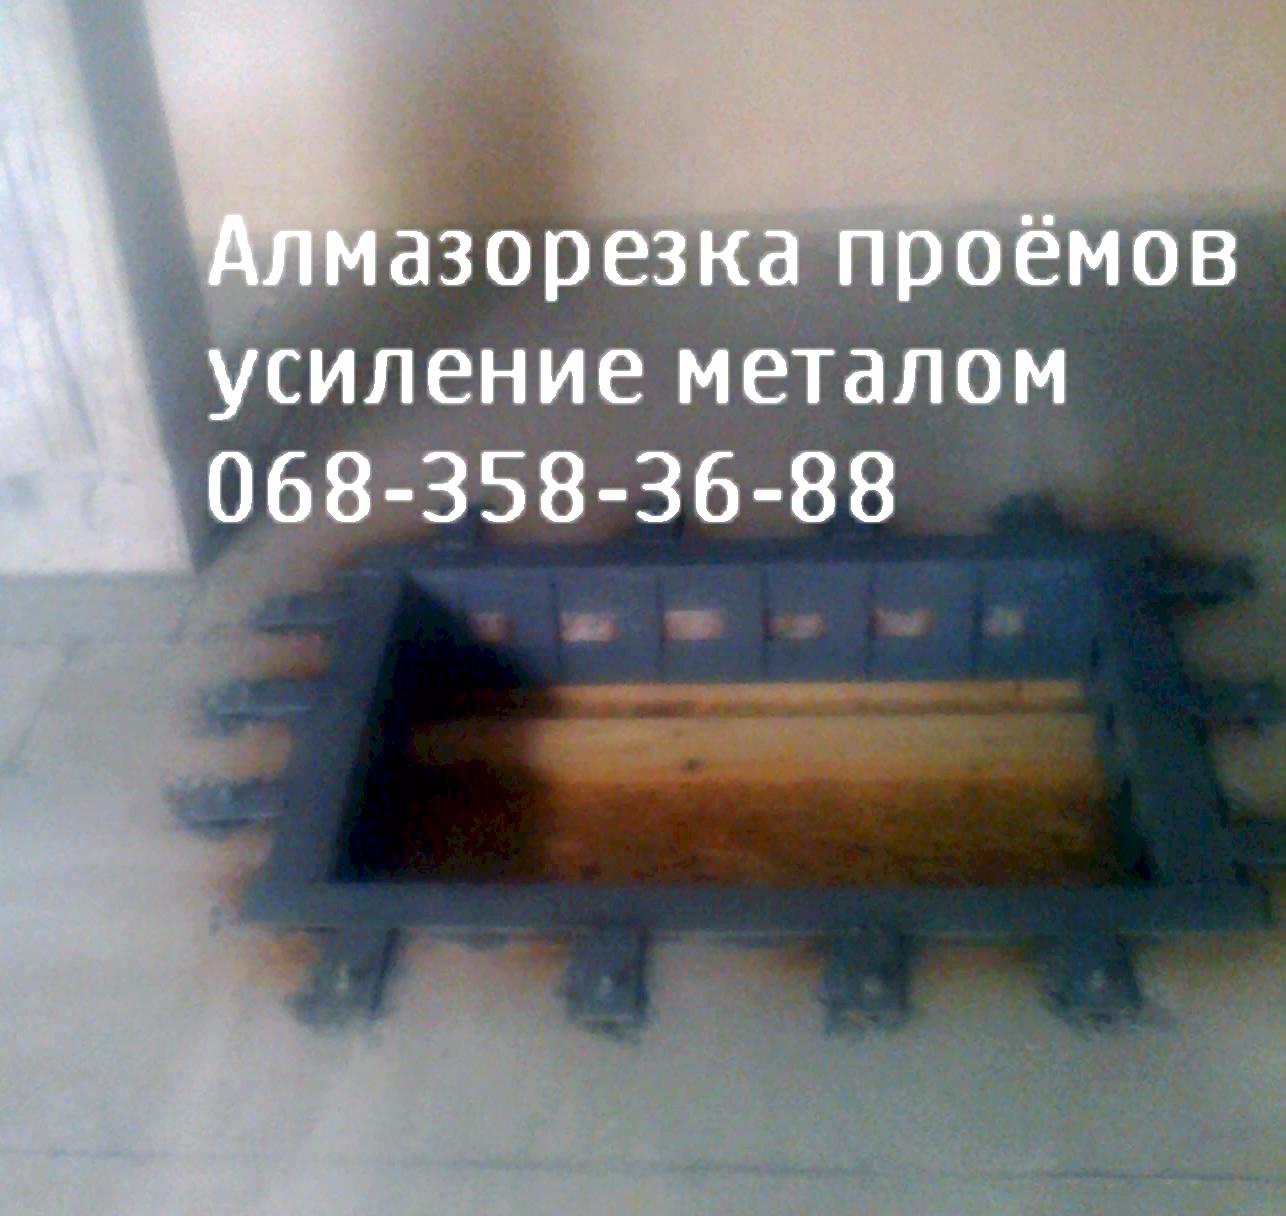 Нажмите на изображение для увеличения Название: Фото0939.jpg Просмотров: 12 Размер:177.0 Кб ID:595169